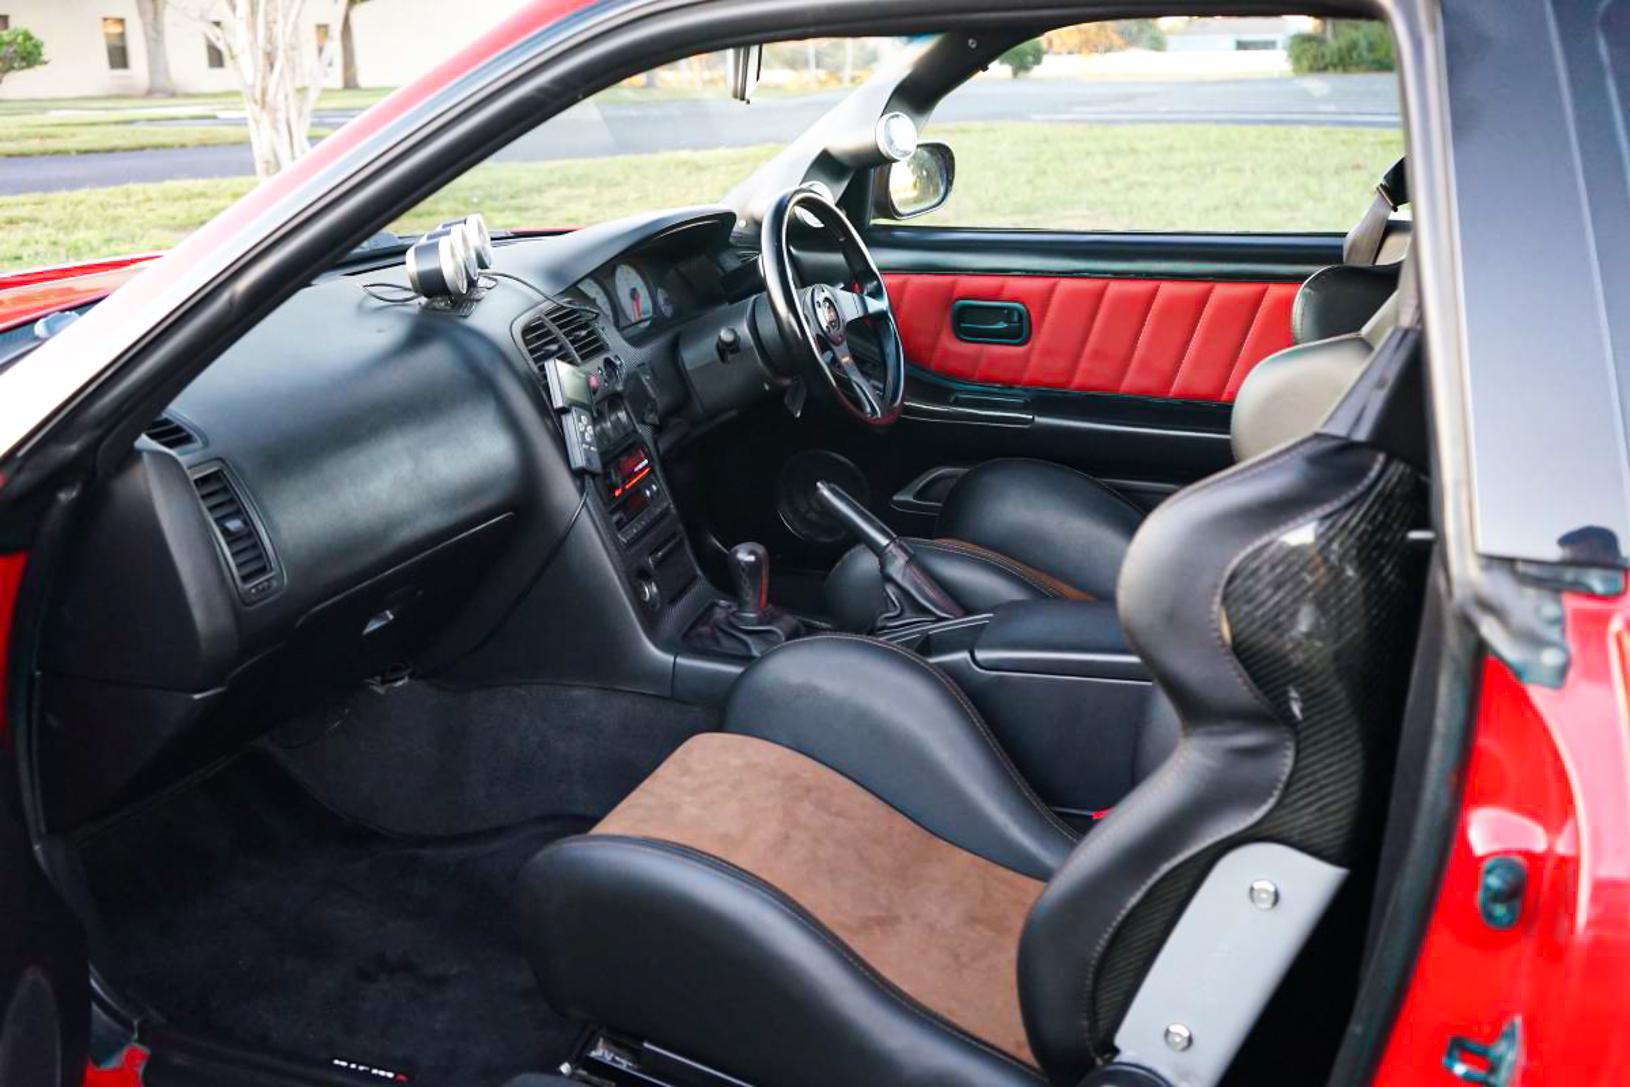 1995 Nissan Skyline GT-R 'V-Spec'